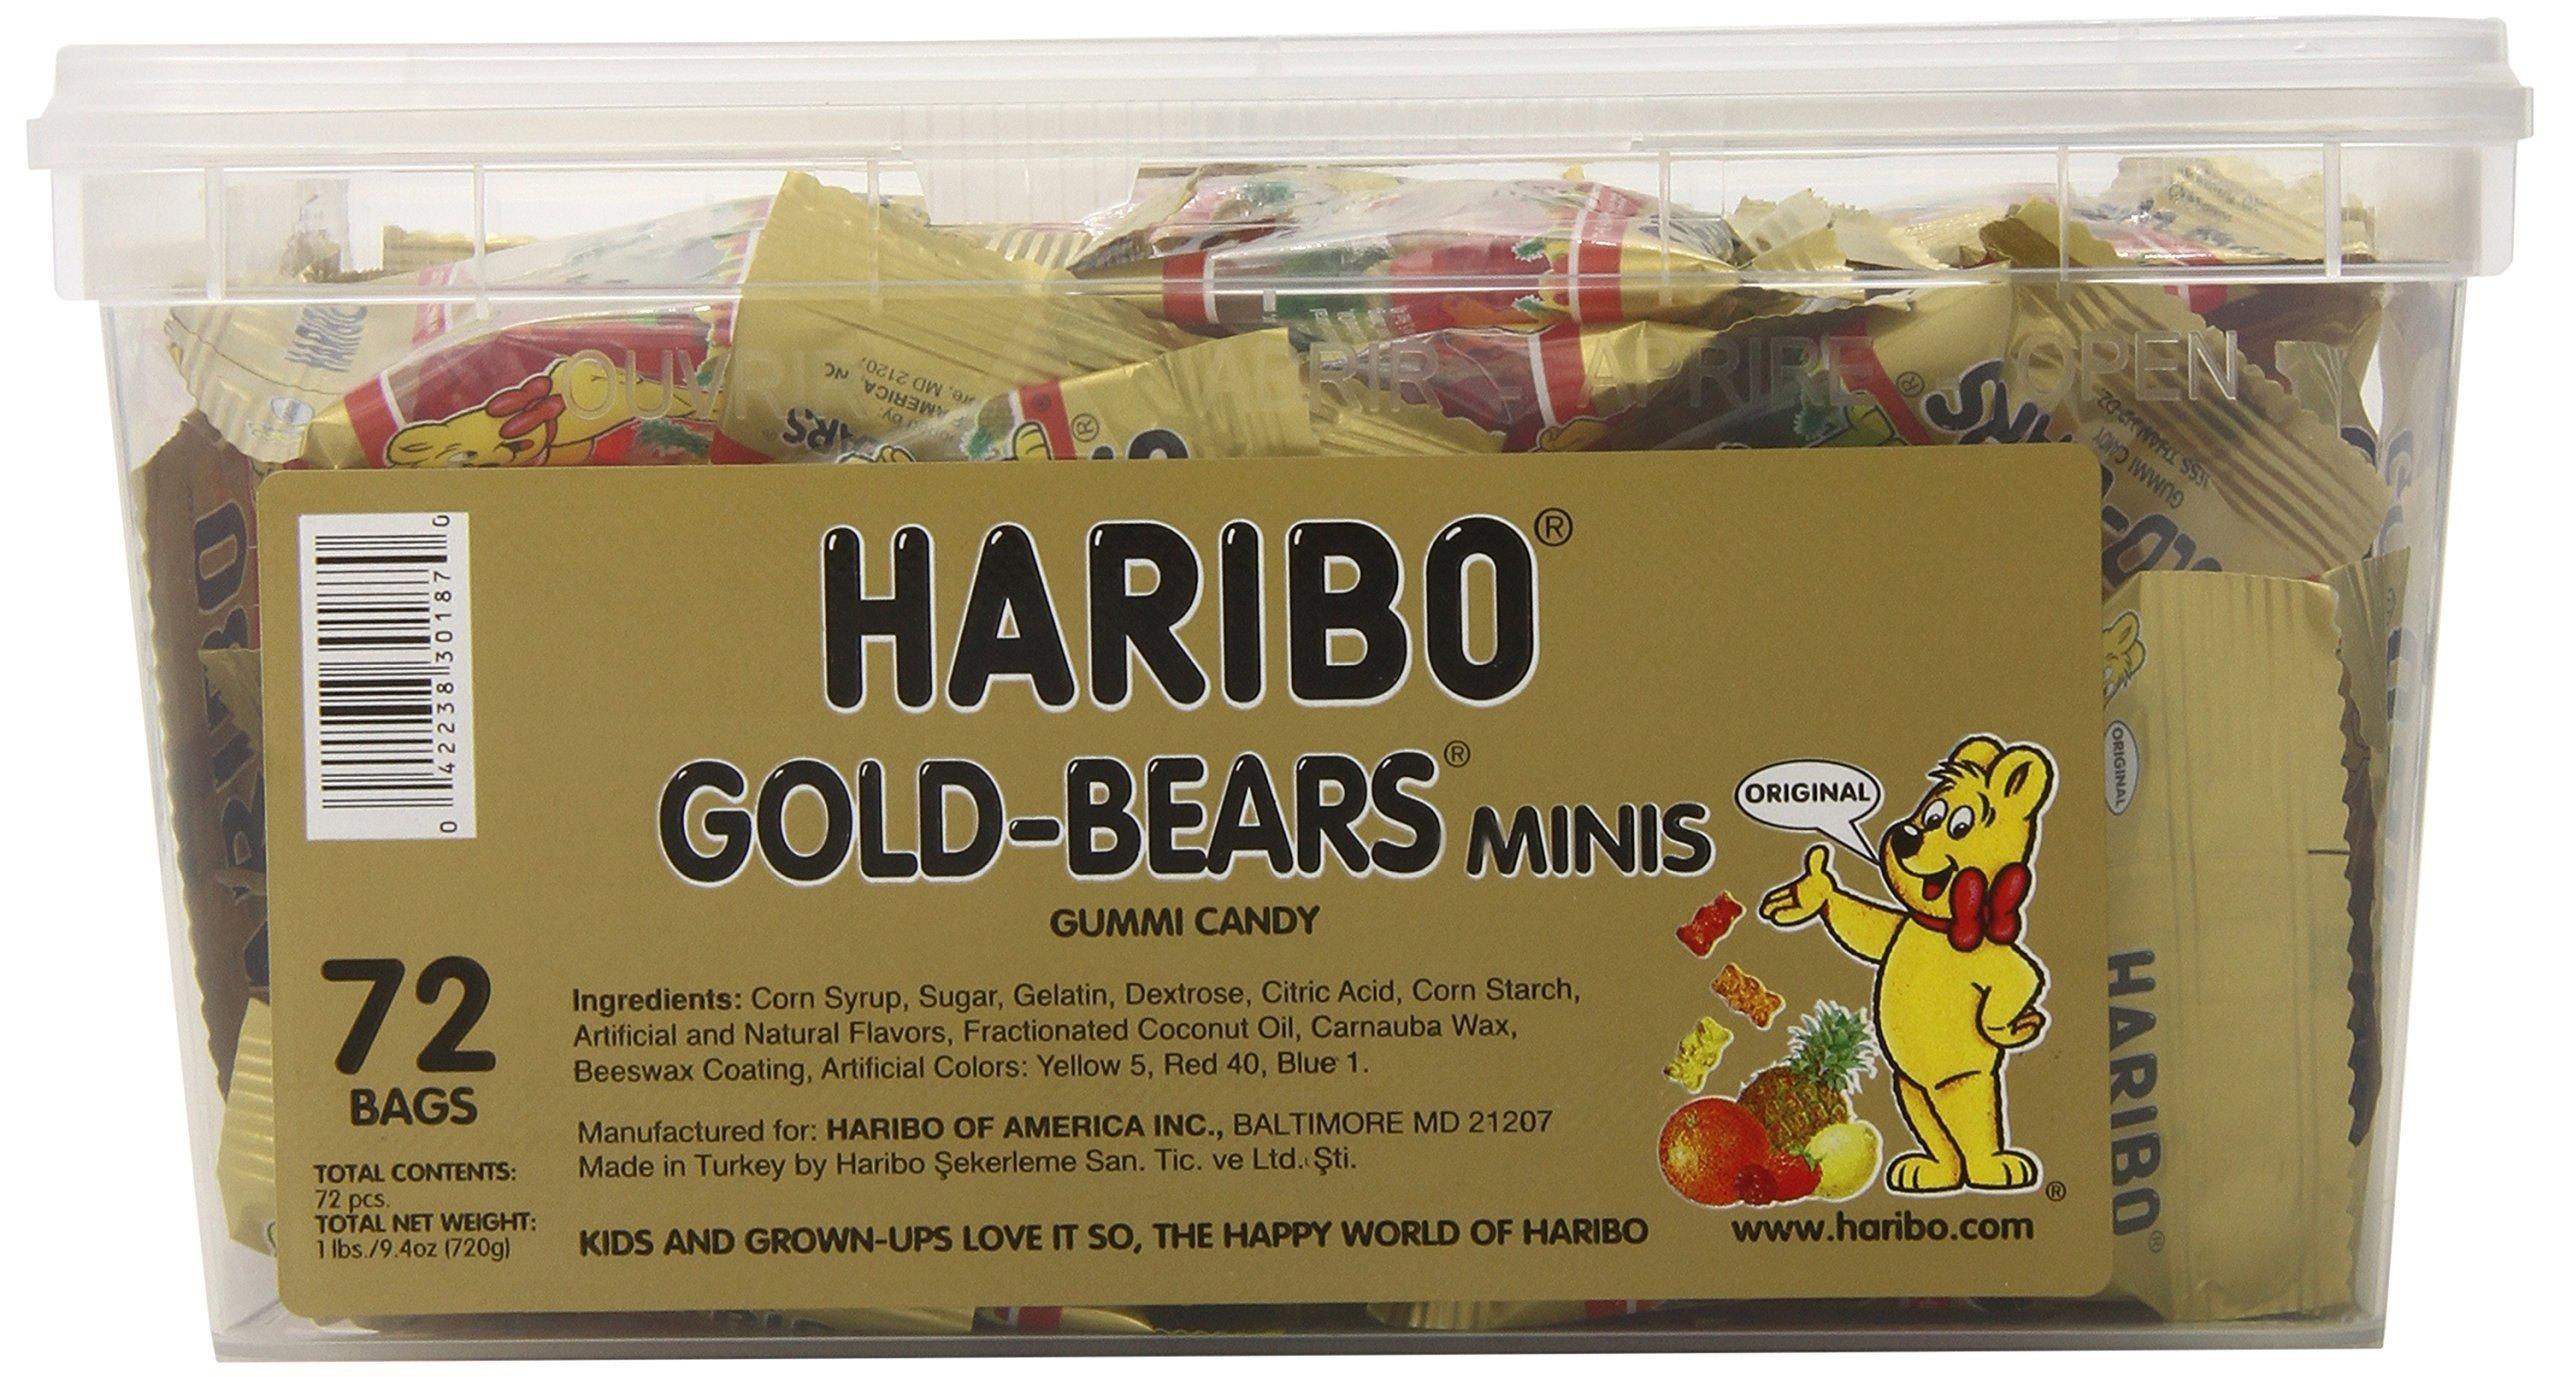 Haribo Goldbears Minis, 72-Count, 1 Pound 9.4 oz  Original Bears in mini bags